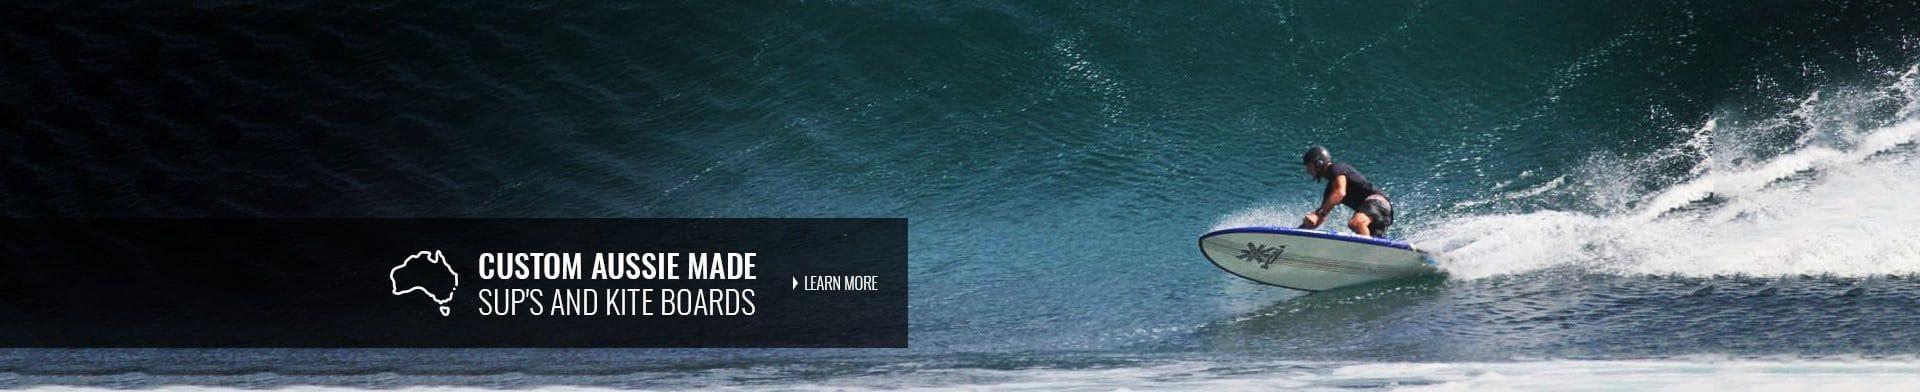 Bombala Boardroom | Custom made SUPS and Kite Boards | Australian Made Kite Boards